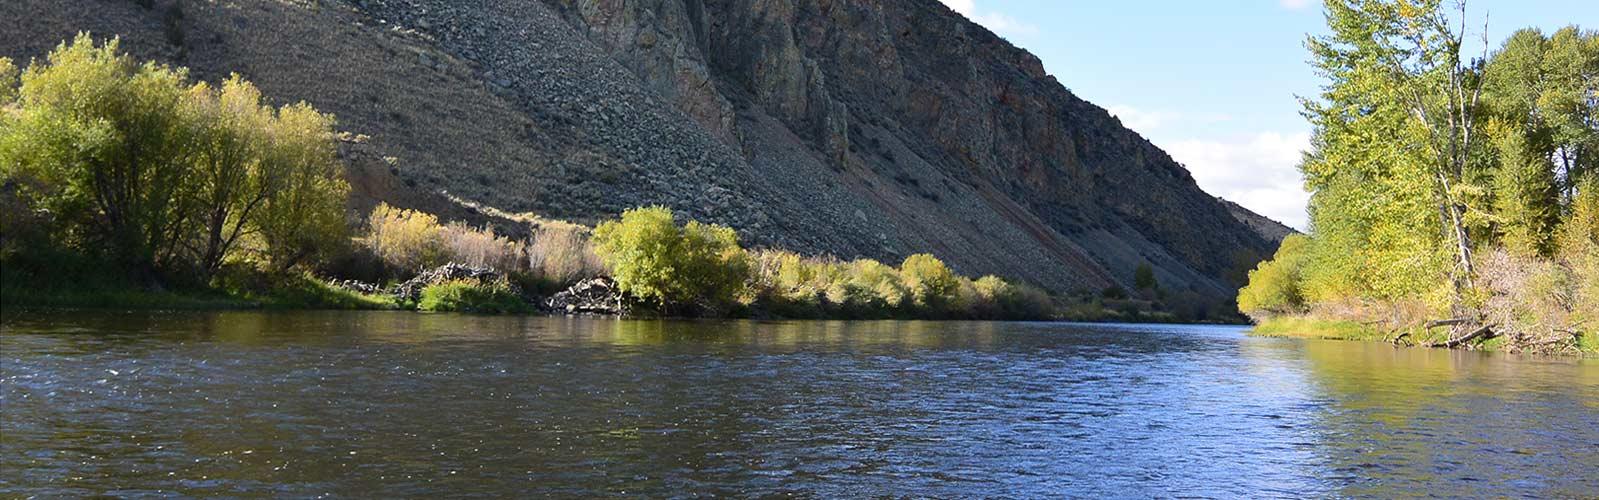 Big hole river fly fishing montana fishtales outfitting for Big hole river fly fishing